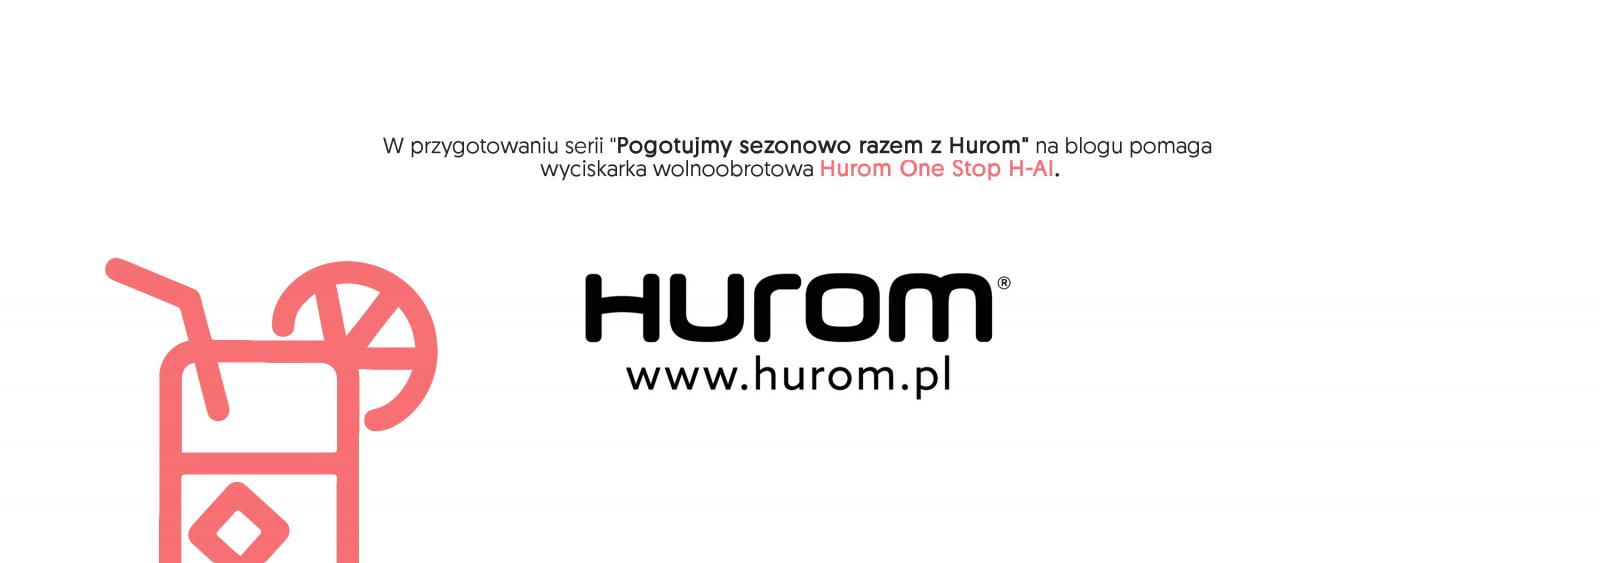 hurom-promo-owoce